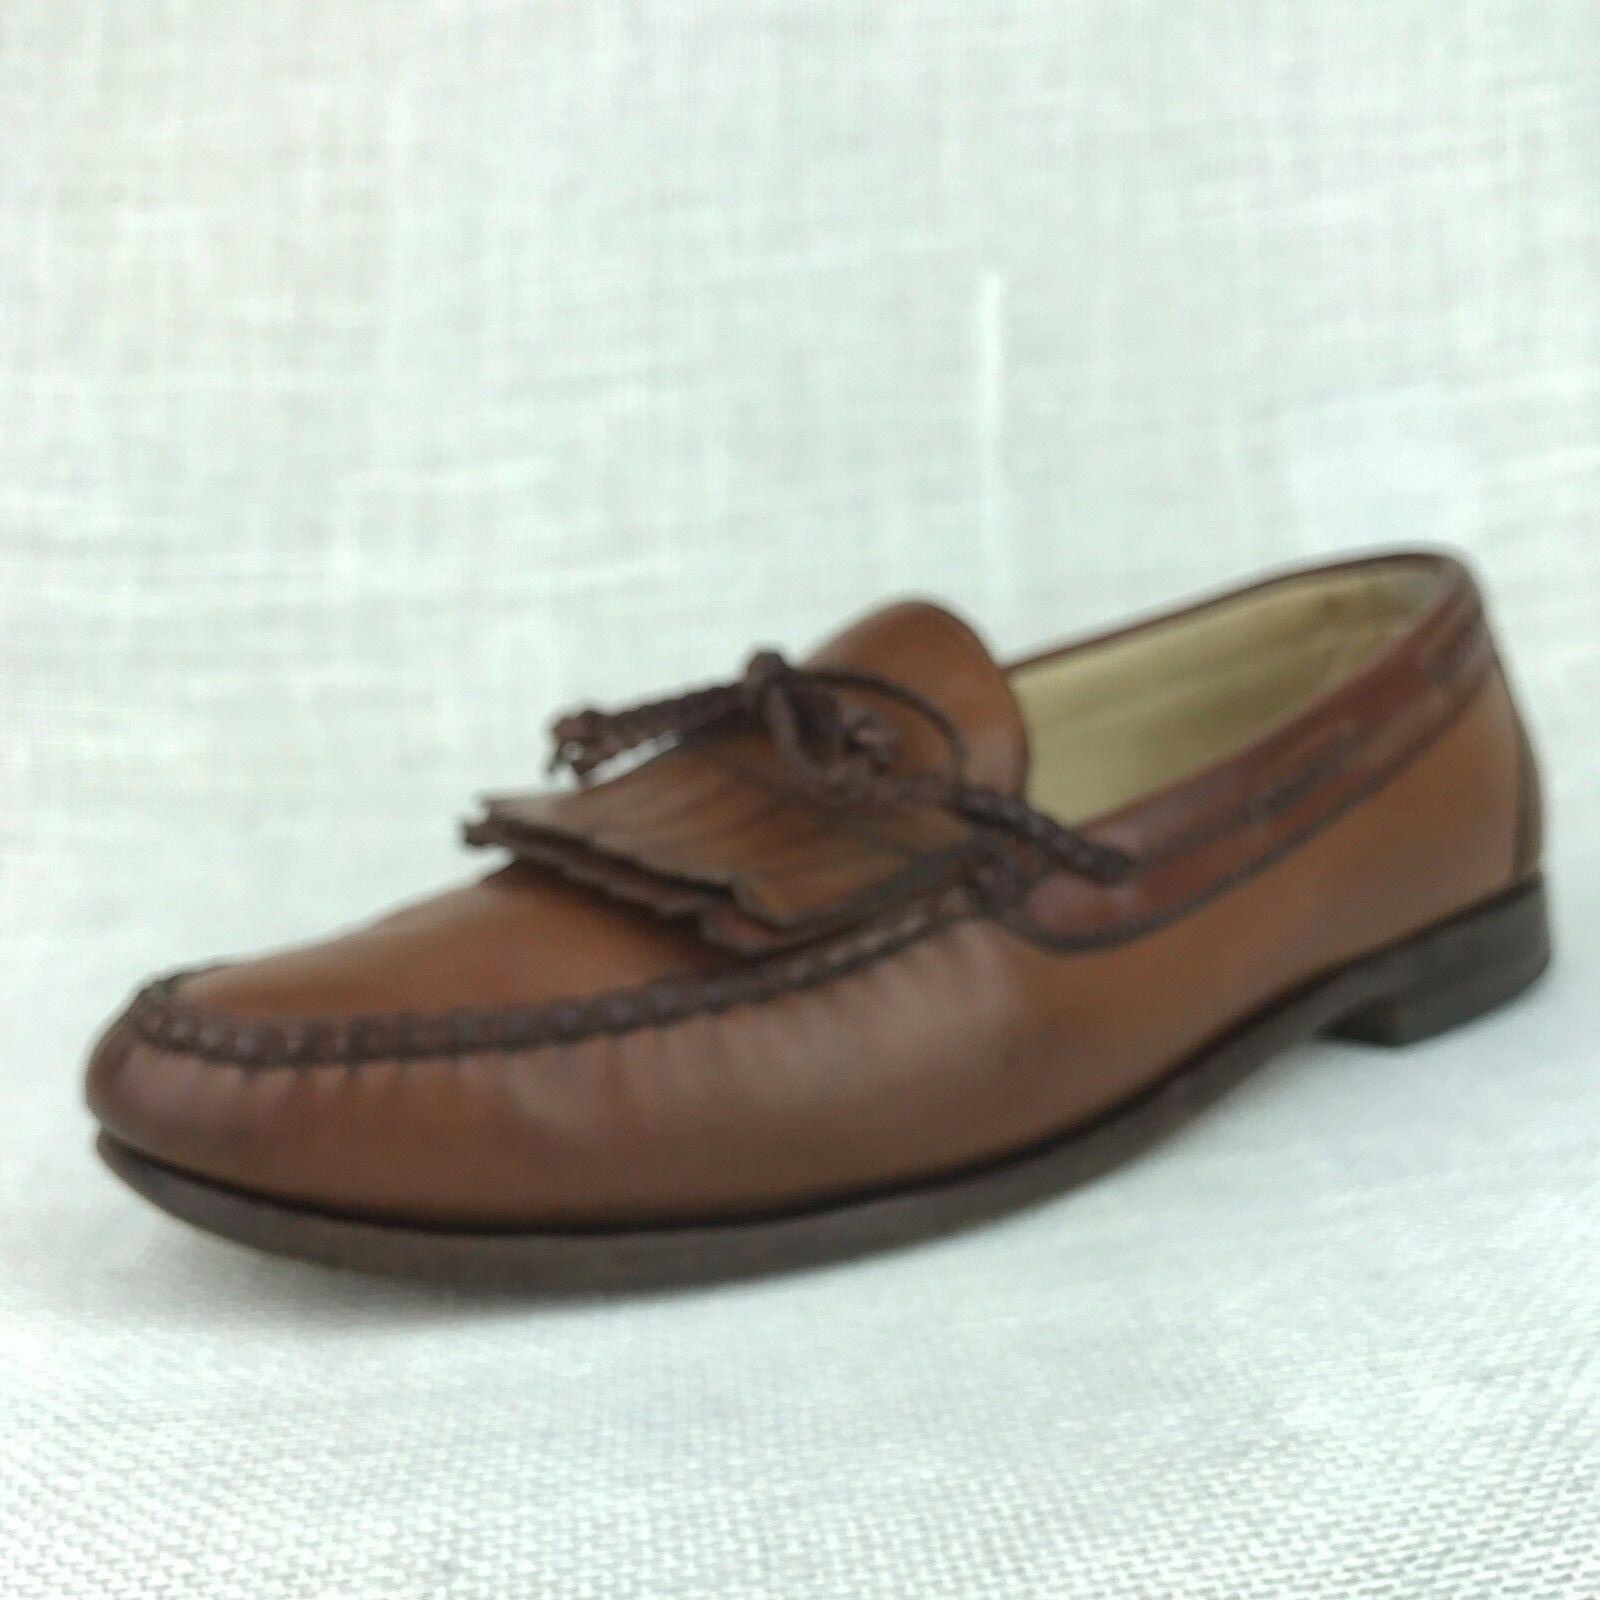 lo stile classico Allen Edmonds Woodstock US 11 D Marrone Leather Kiltie Tassel Tassel Tassel Dress Loafers USA  promozioni di sconto